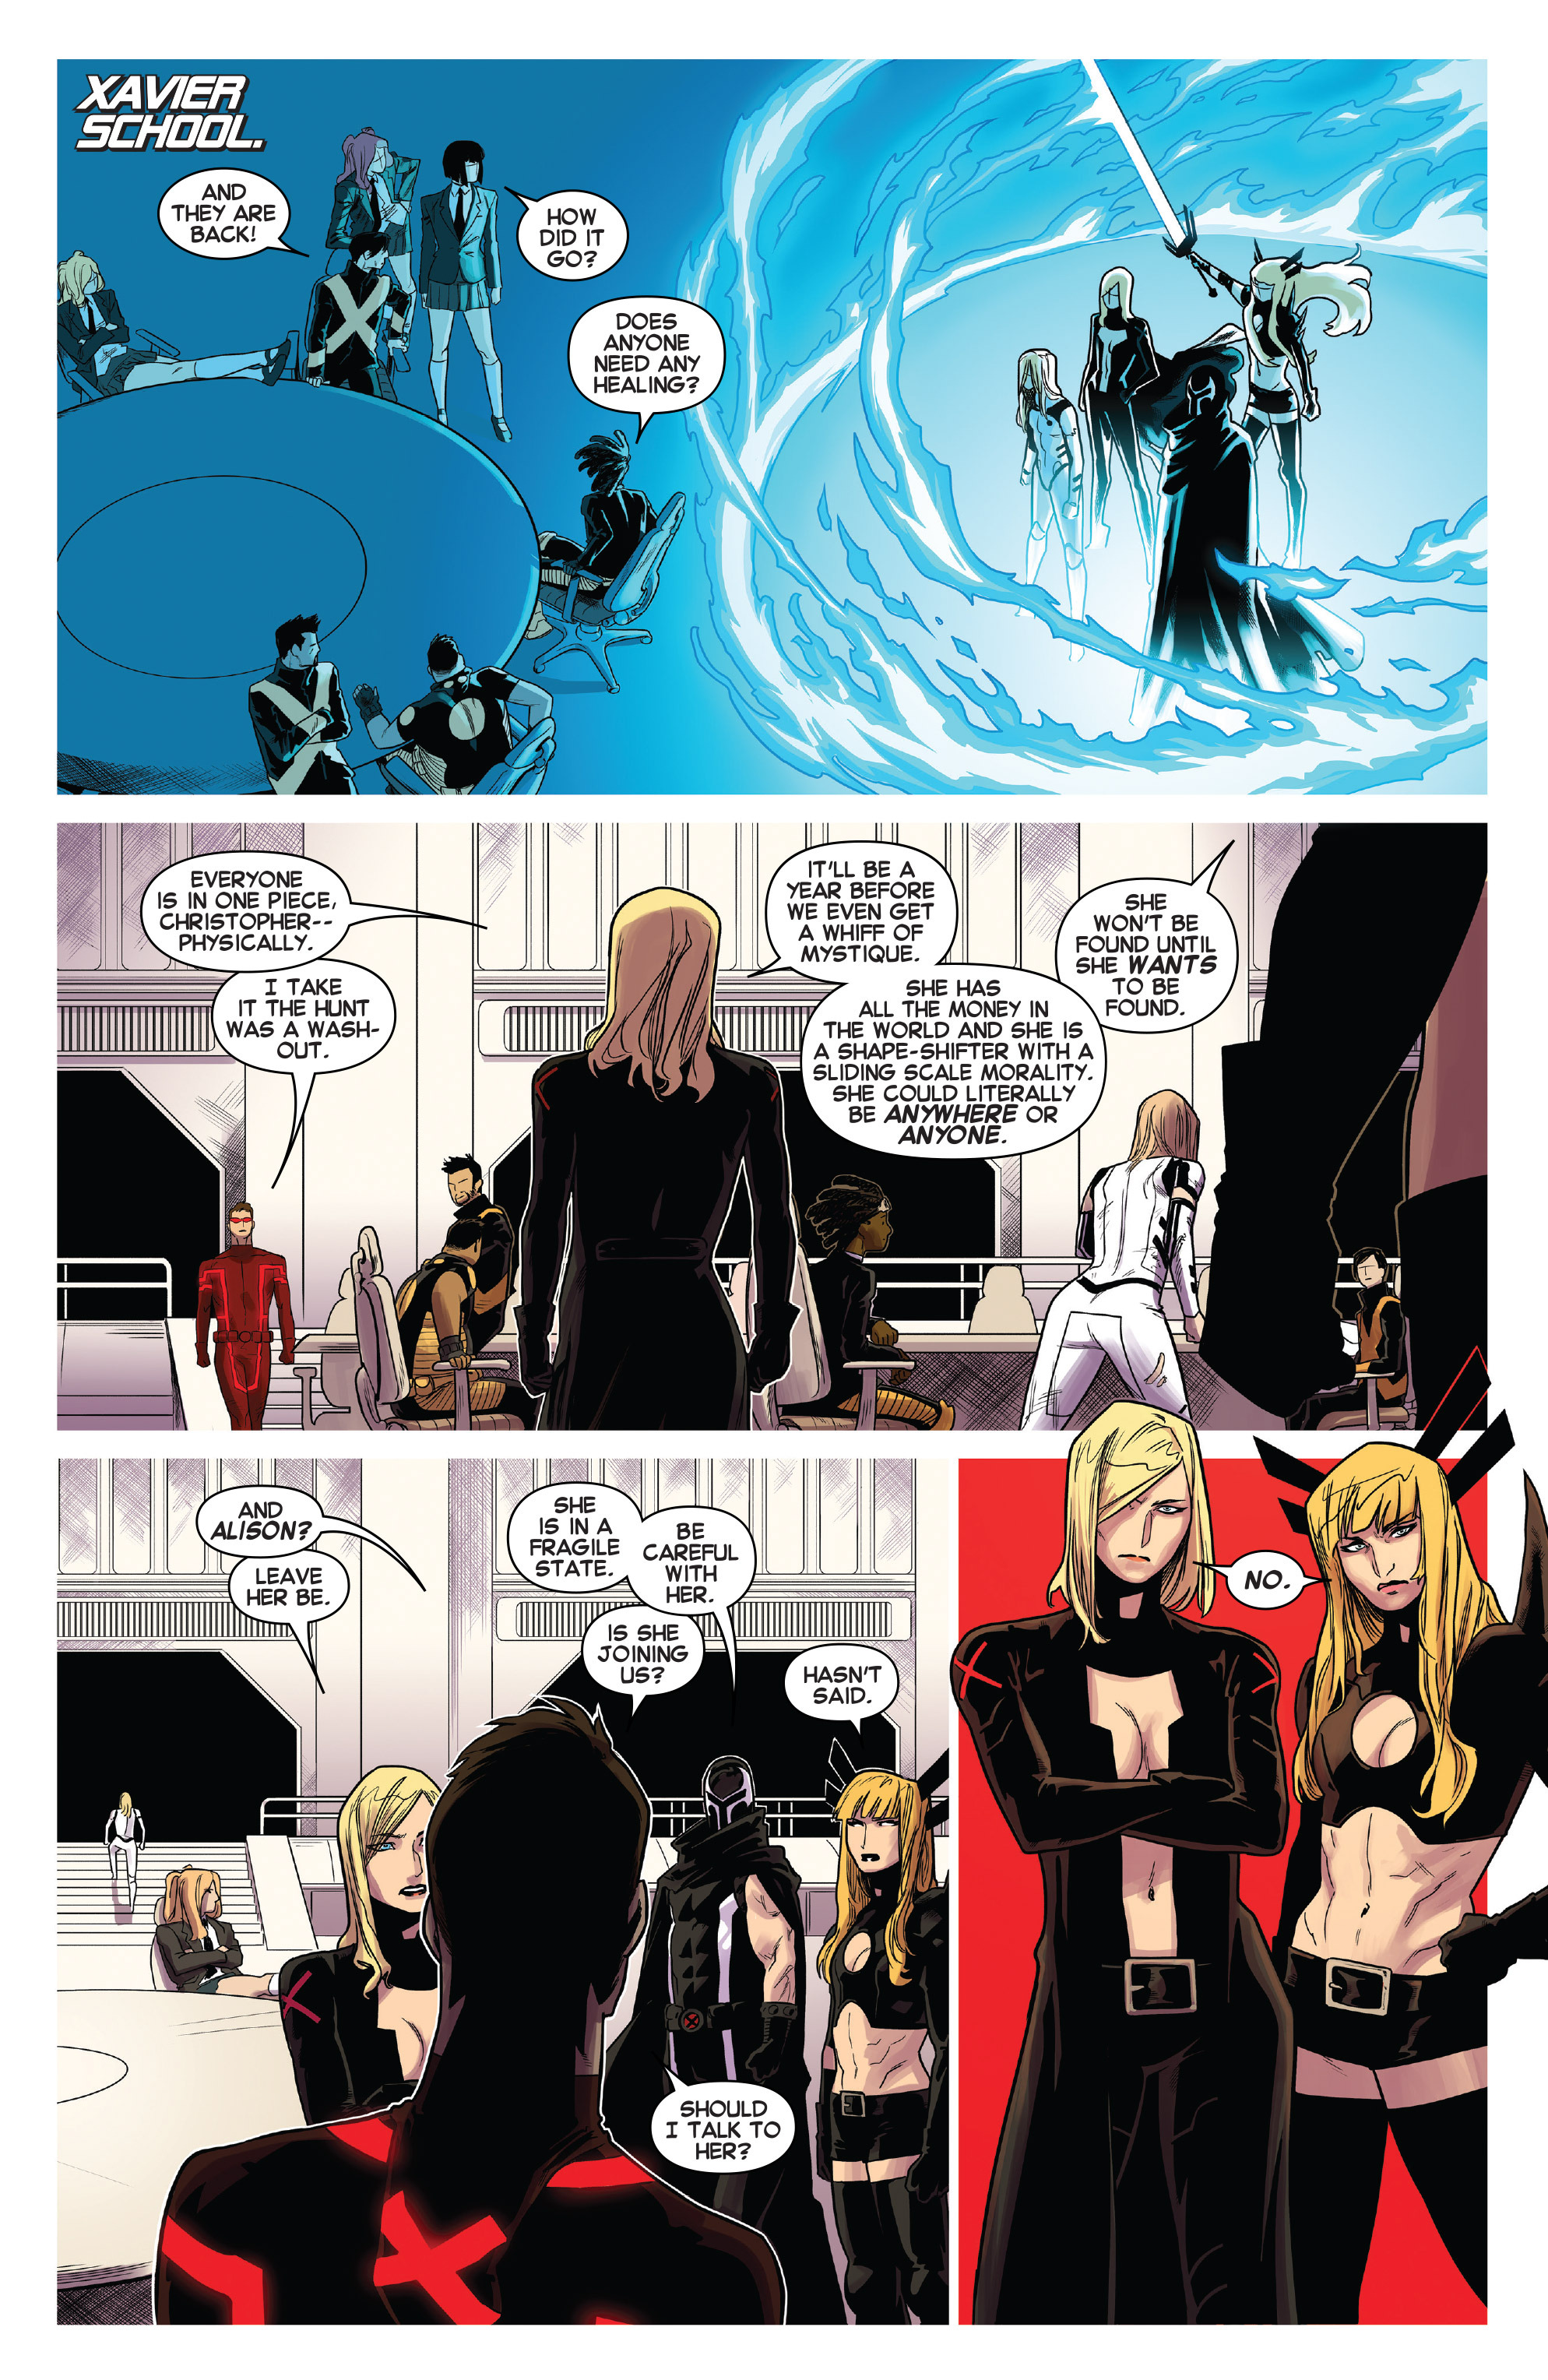 Read online Uncanny X-Men (2013) comic -  Issue # _TPB 4 - vs. S.H.I.E.L.D - 92